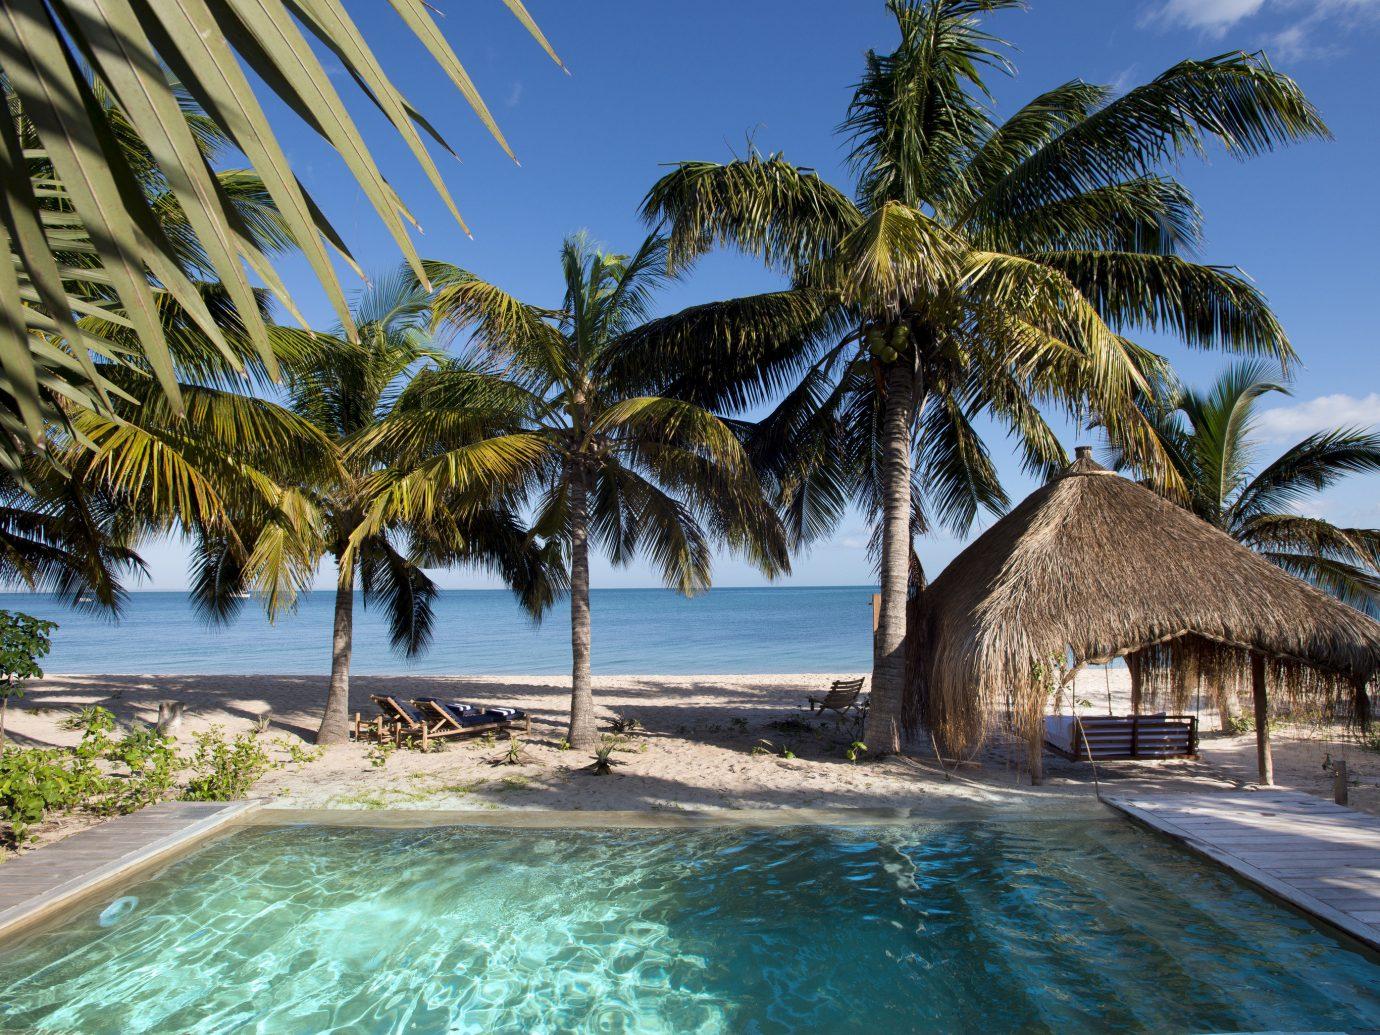 Trip Ideas outdoor tree sky palm water Resort Beach Pool vacation swimming pool caribbean Ocean Sea tropics palm family arecales estate Coast Lagoon plant bay lined swimming